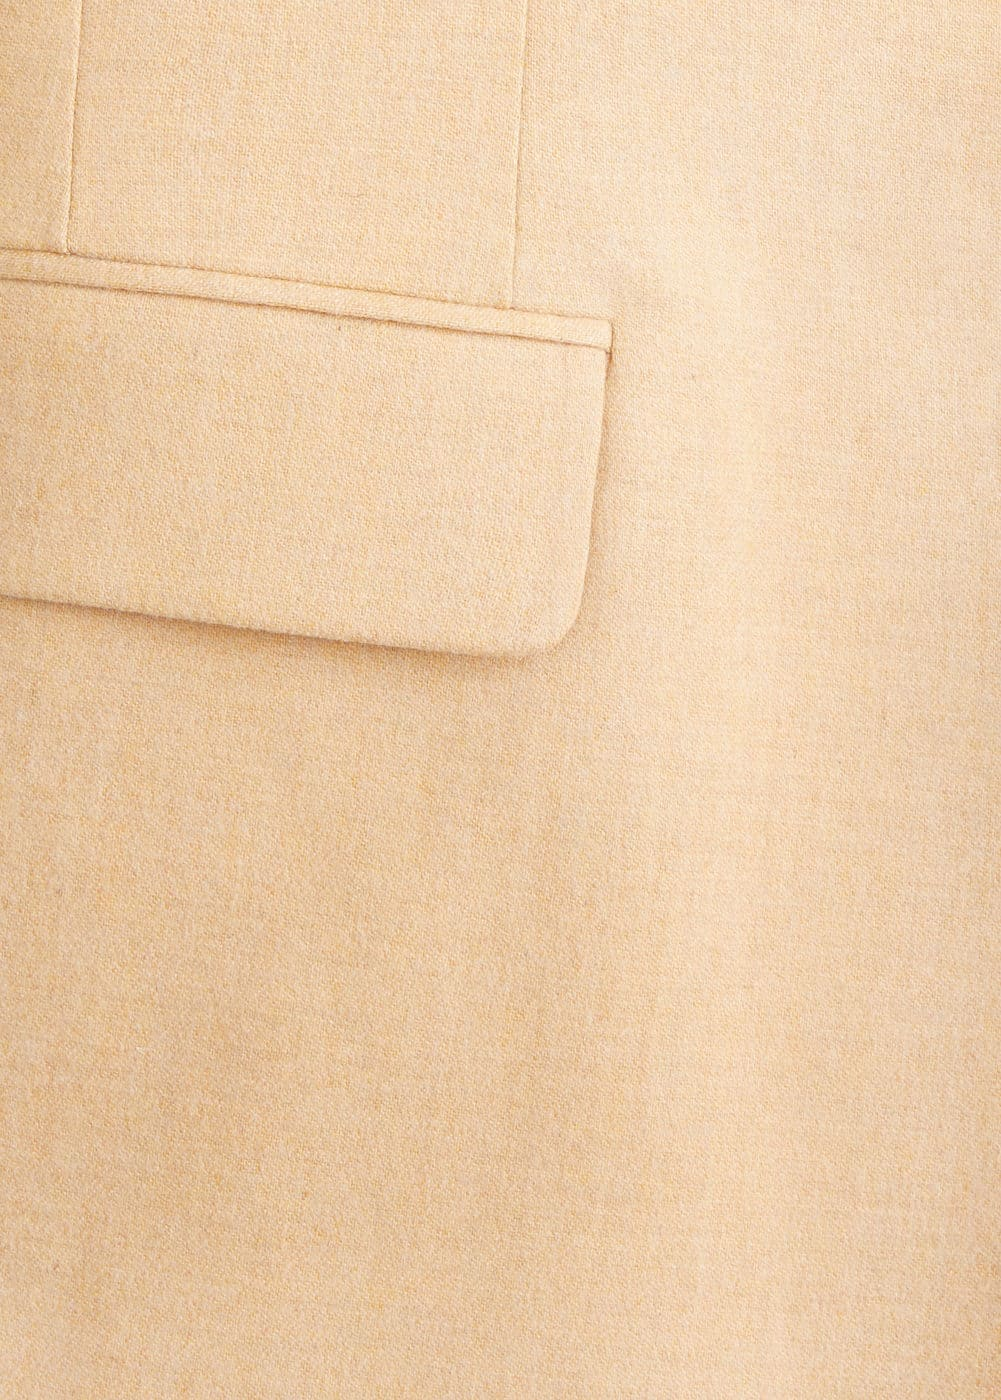 Mango - Americana traje lana - 11